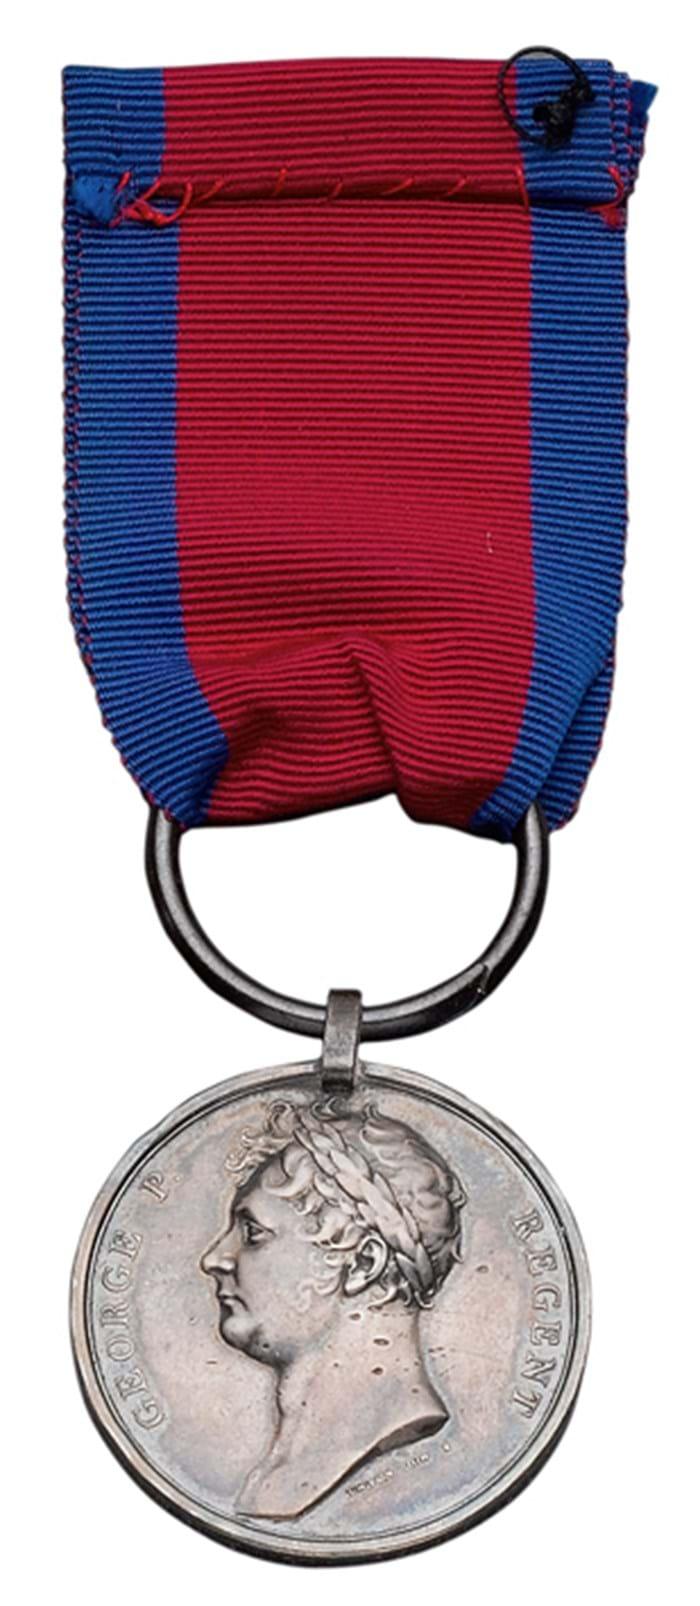 Waterloo Medal awarded to Captain Edwin Sandys